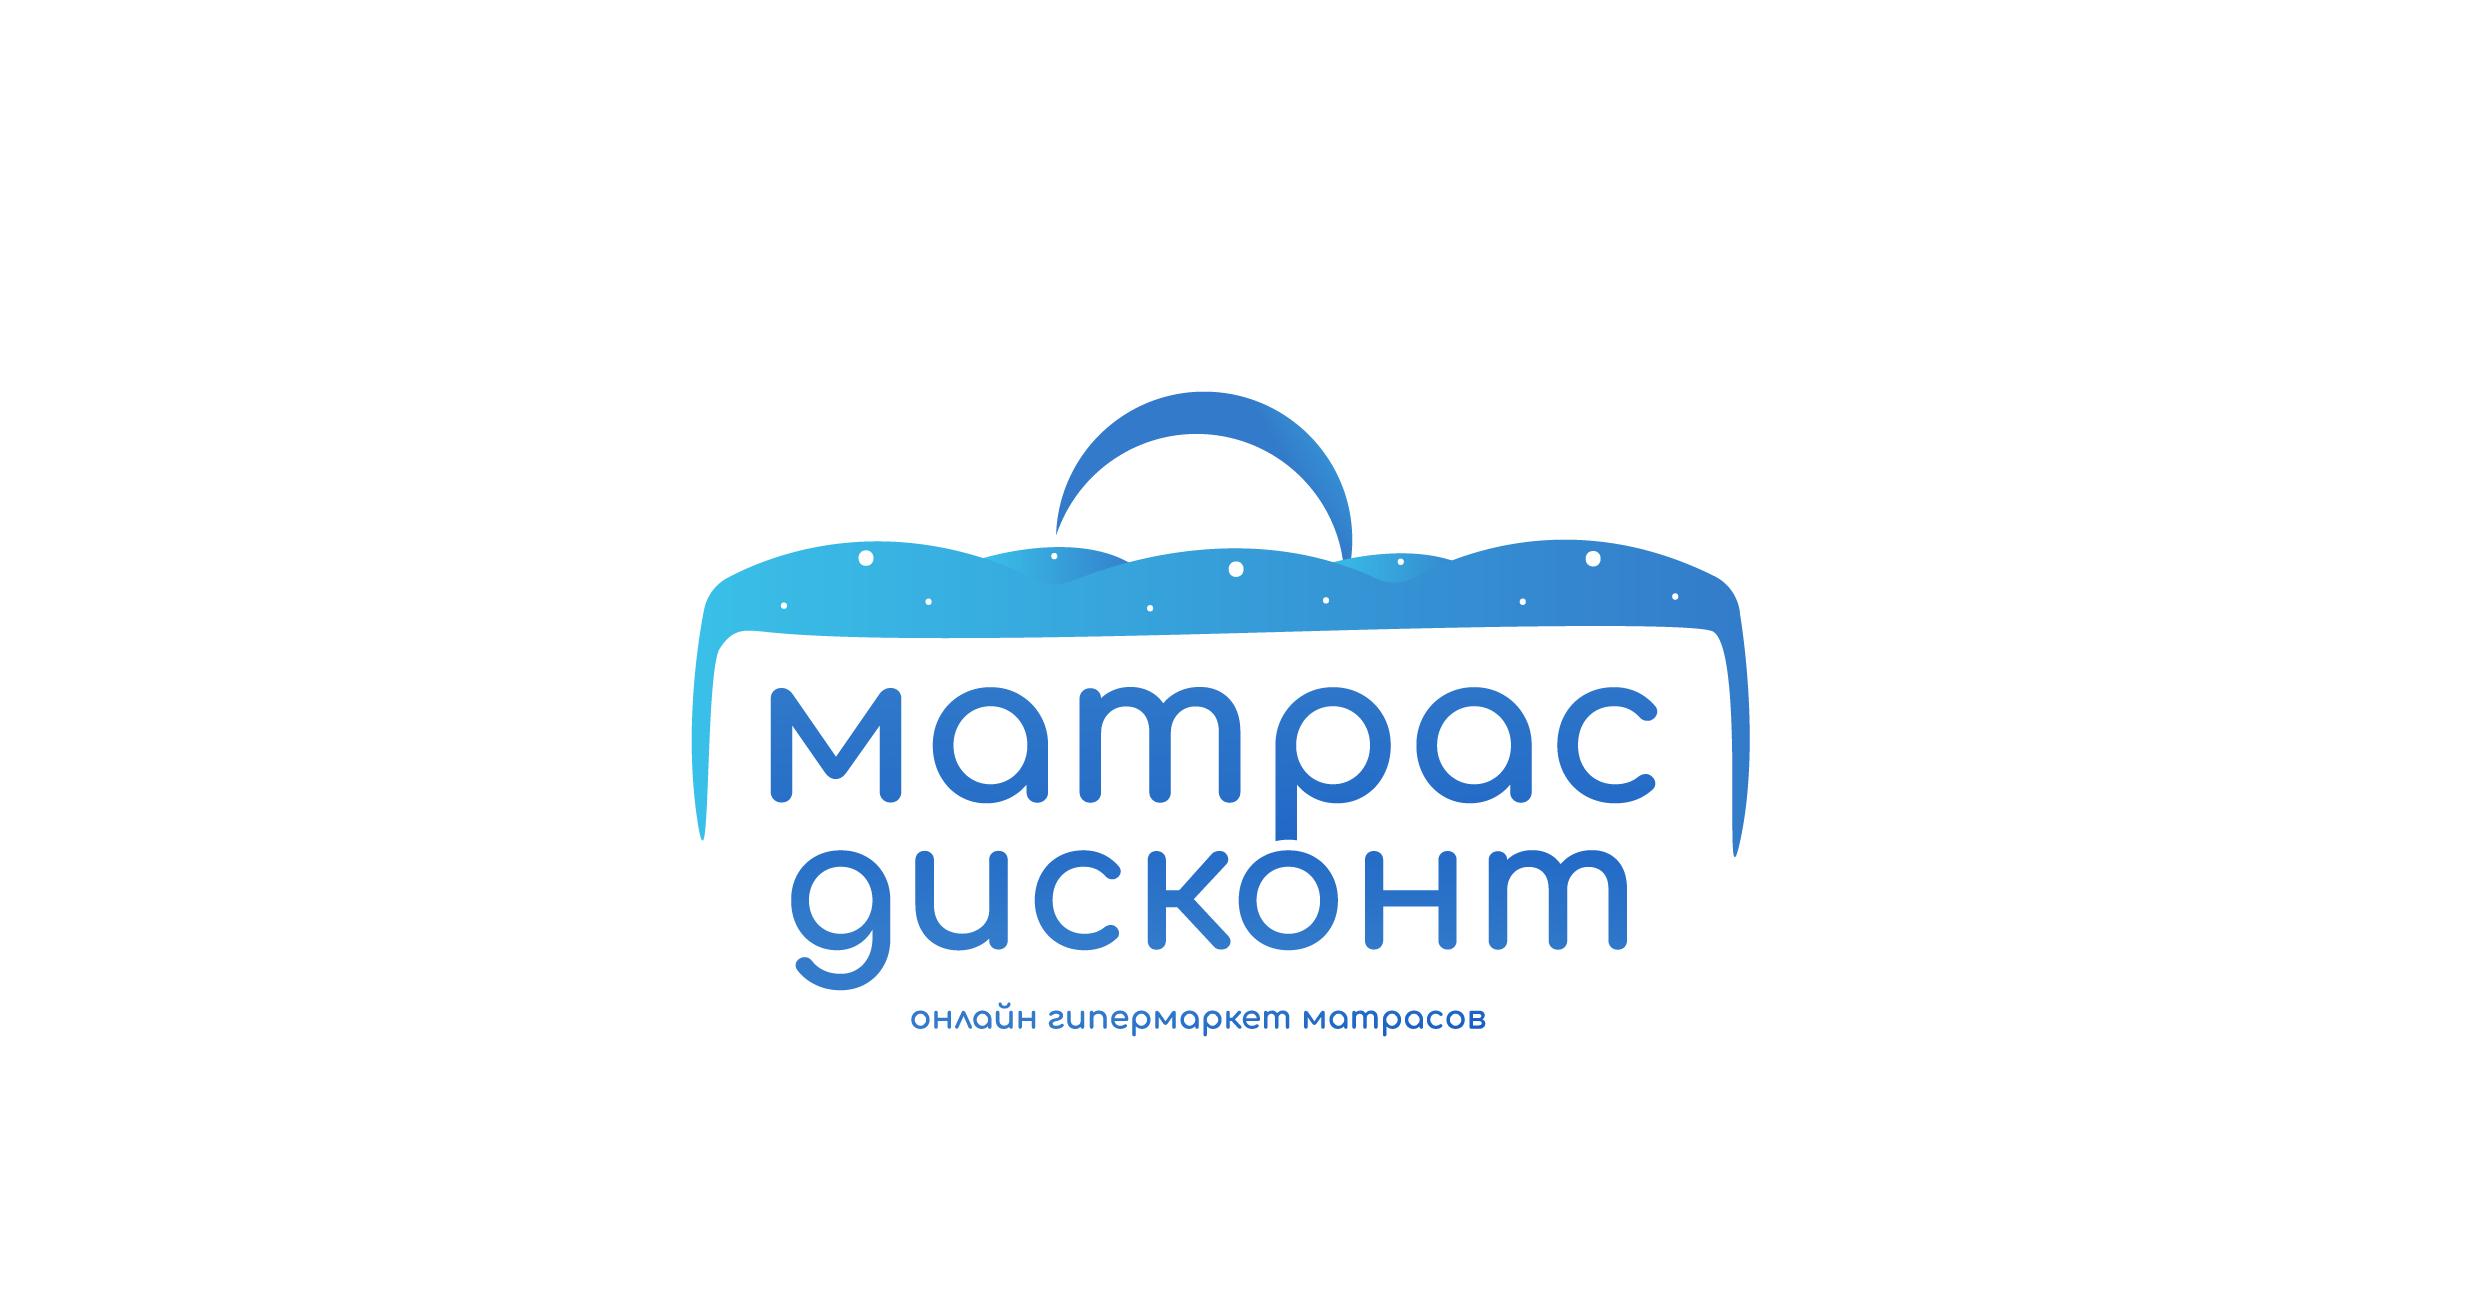 Логотип для ИМ матрасов фото f_5295c876b7b1cf7f.png